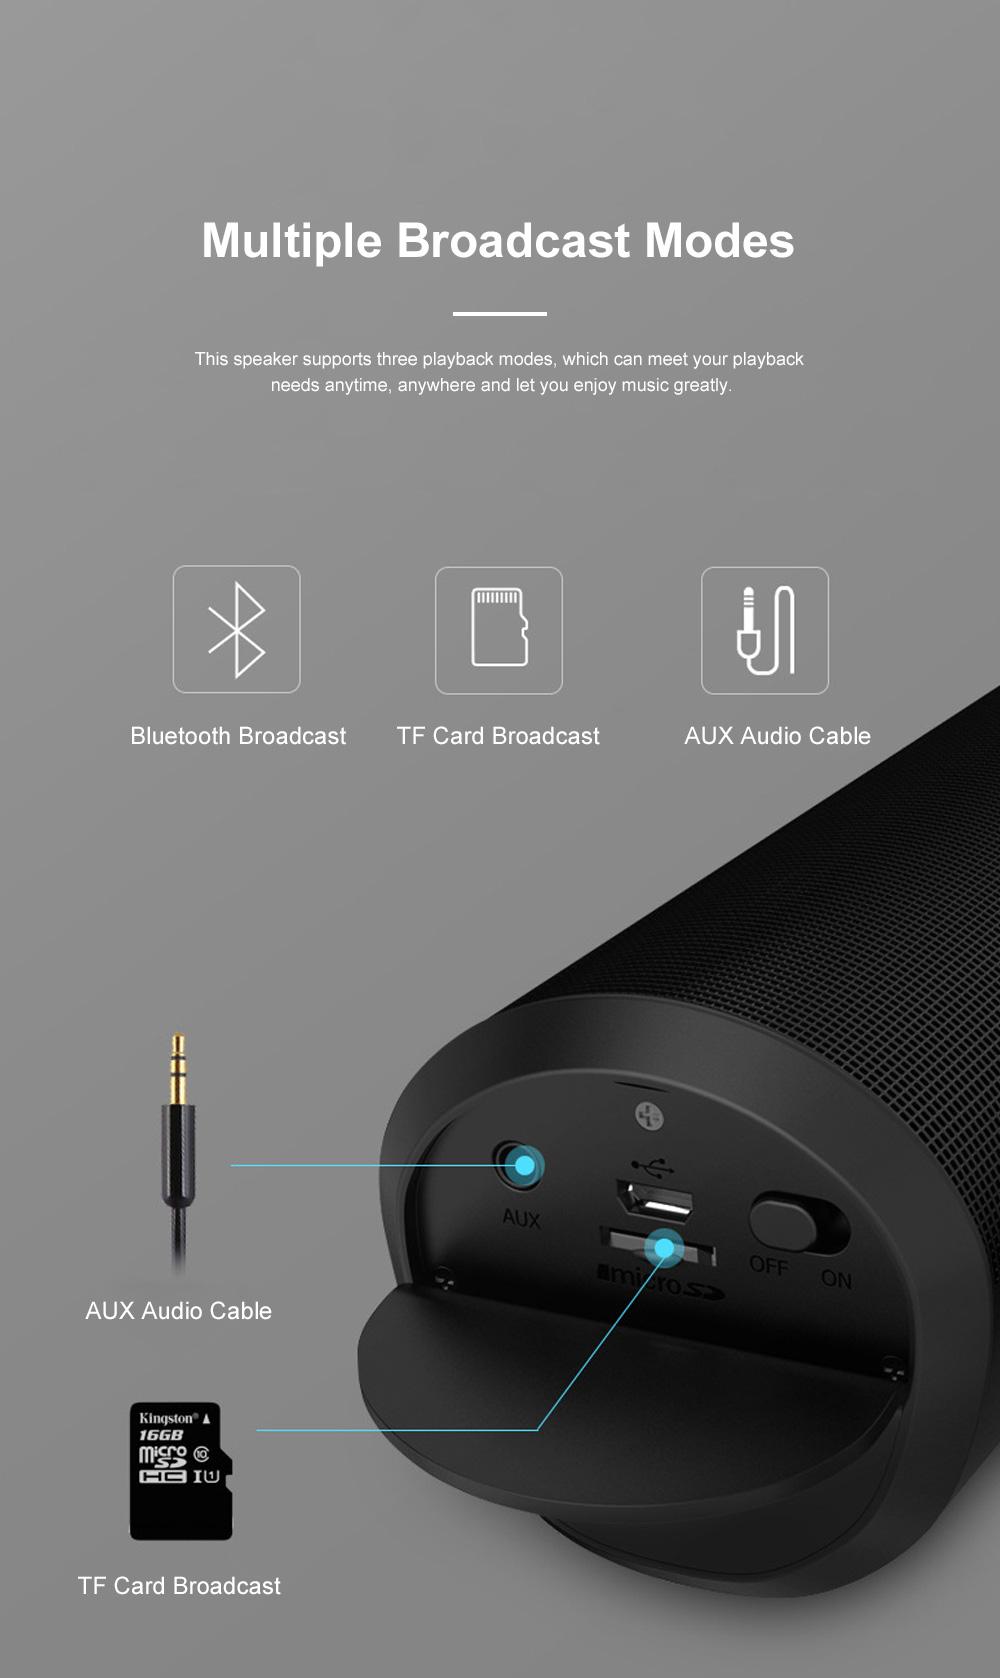 T900 Mini Multifunctional Portable Long Endurance Wireless Bluetooth Loudspeaker Box Speaker with Fantasy Light Effects 5